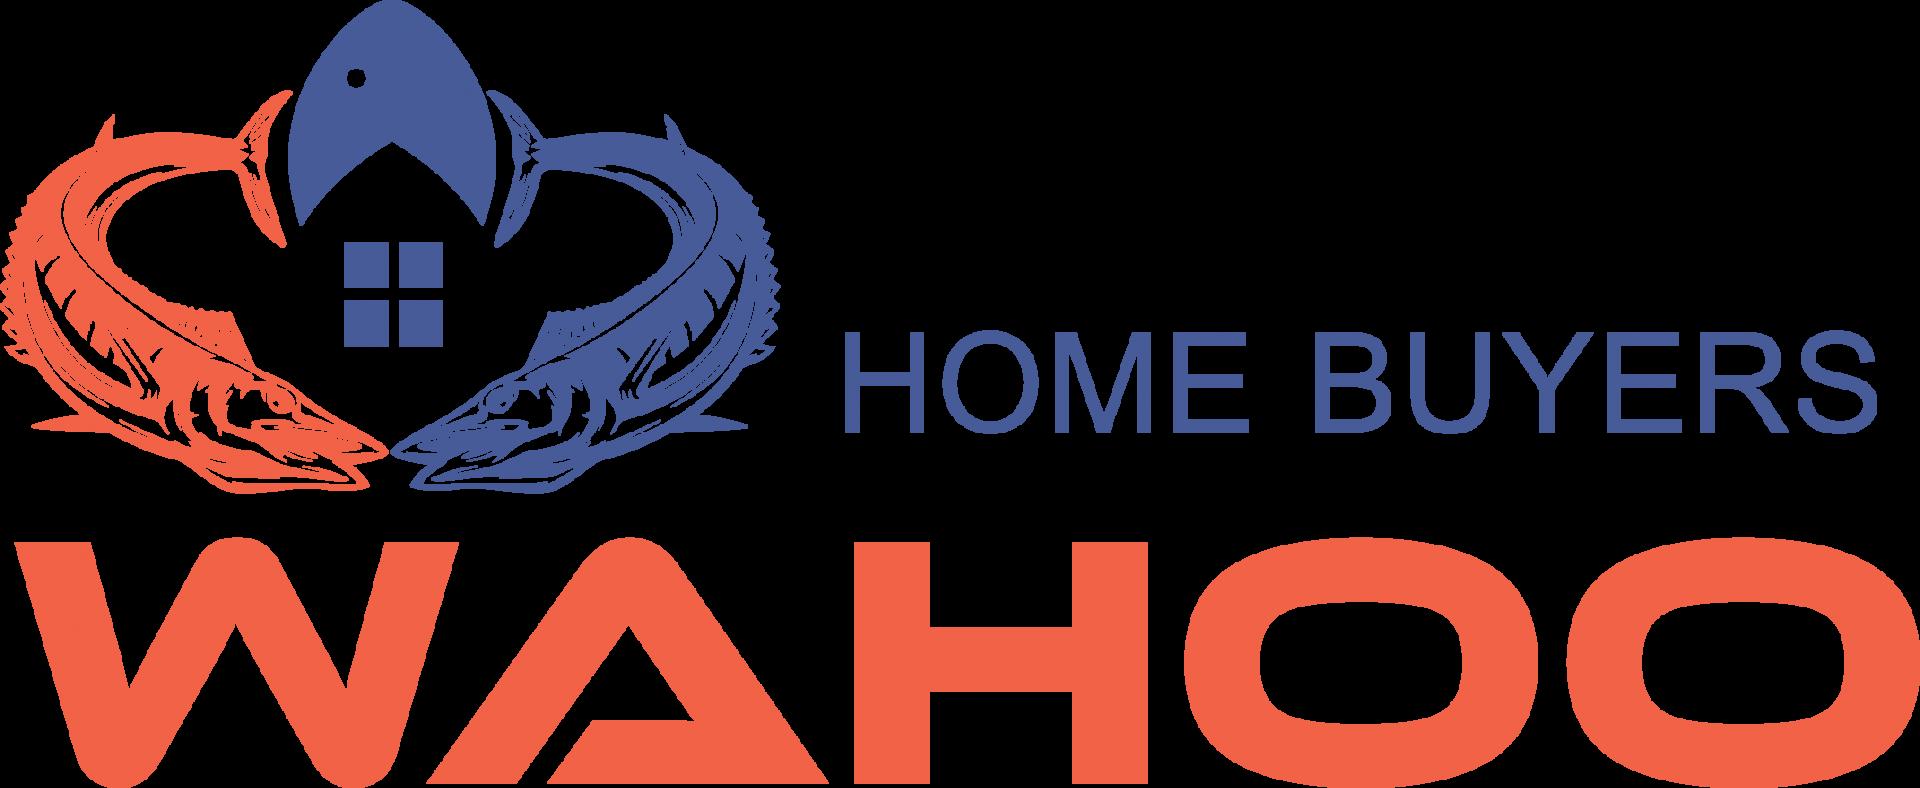 Wahoo Home Buyers  logo